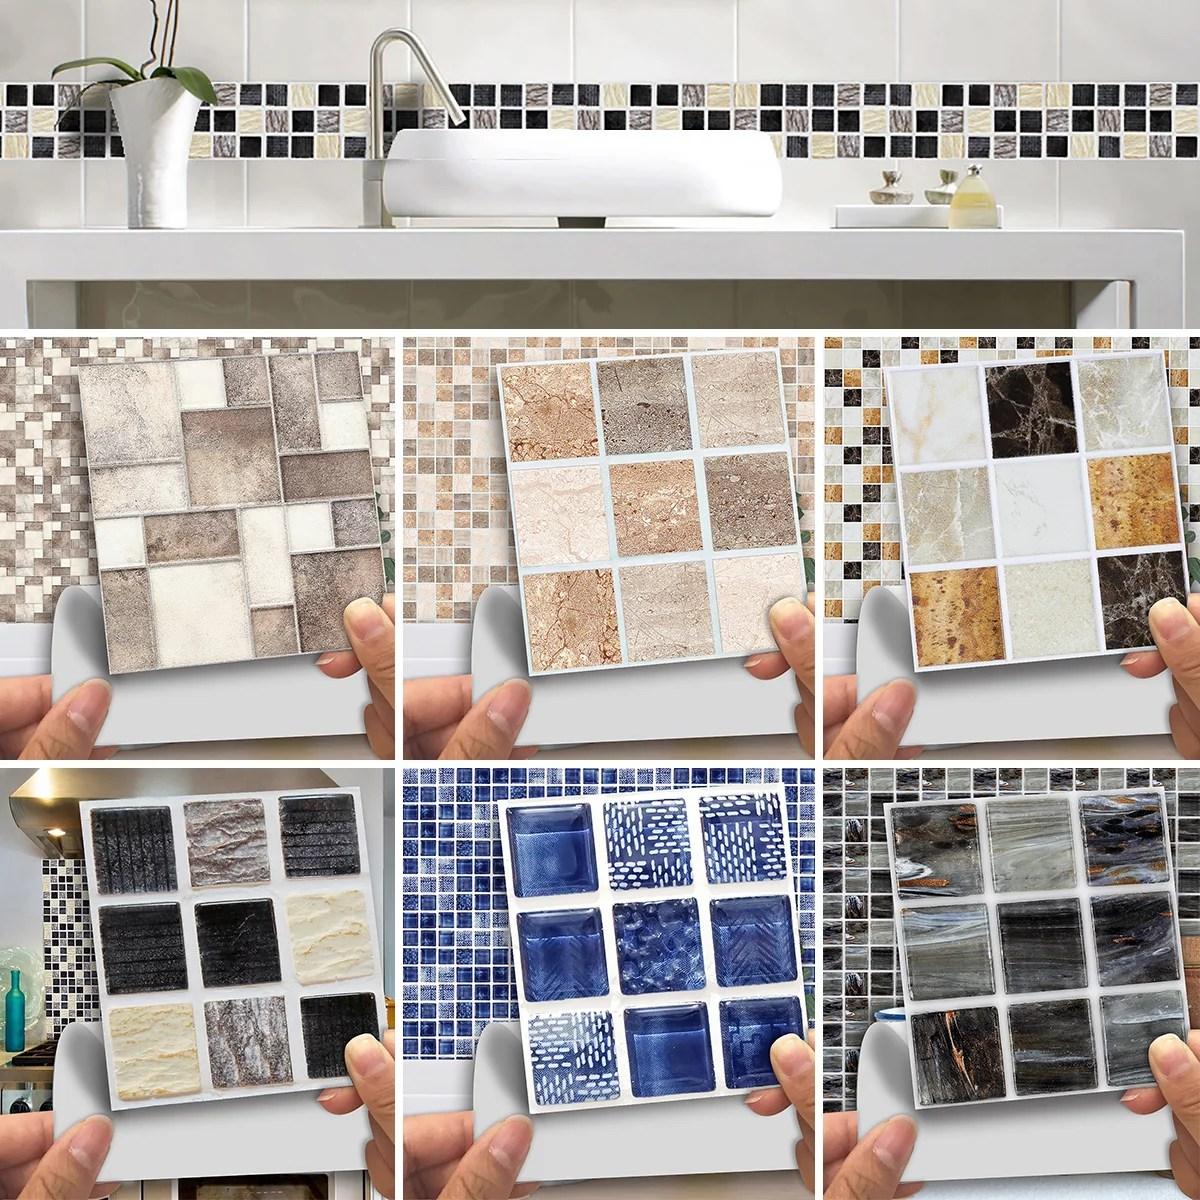 10 10cm 180x self adhesive waterproof marble mosaic wall art tile sticker kitchen bathroom home decor walmart com